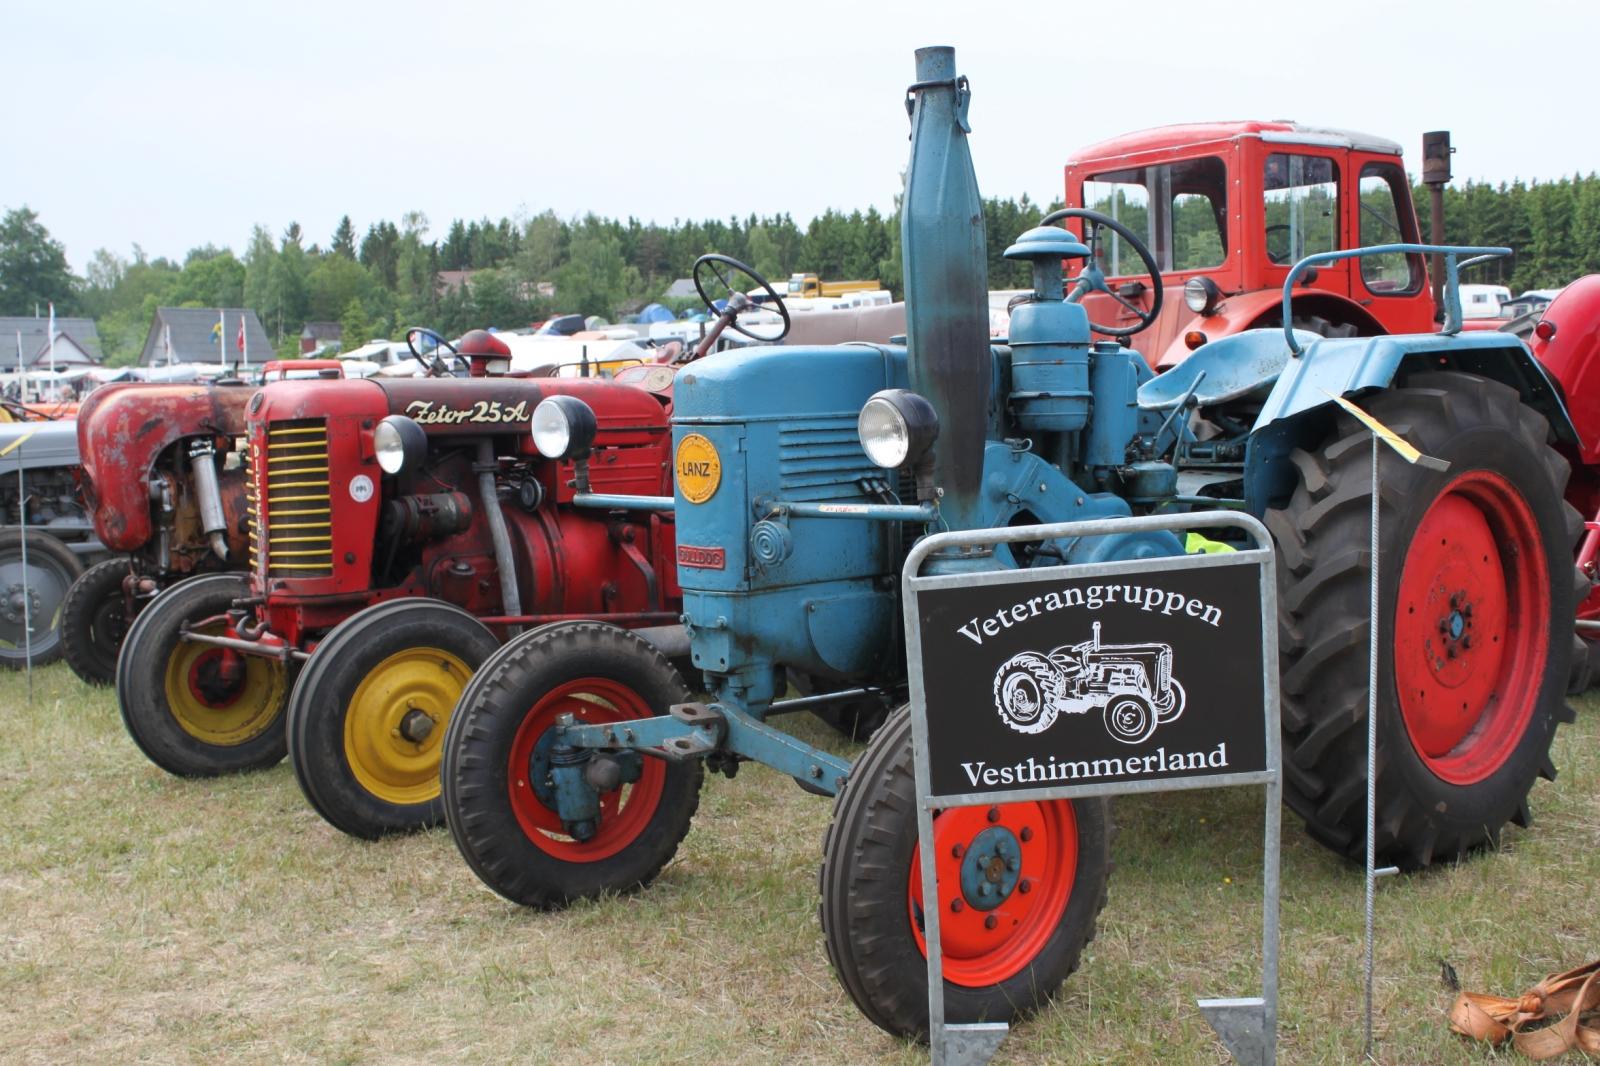 kongensbro-2010-196-5a5be44b2a5aae65edc4ed7e713d0dac0f40f6cf